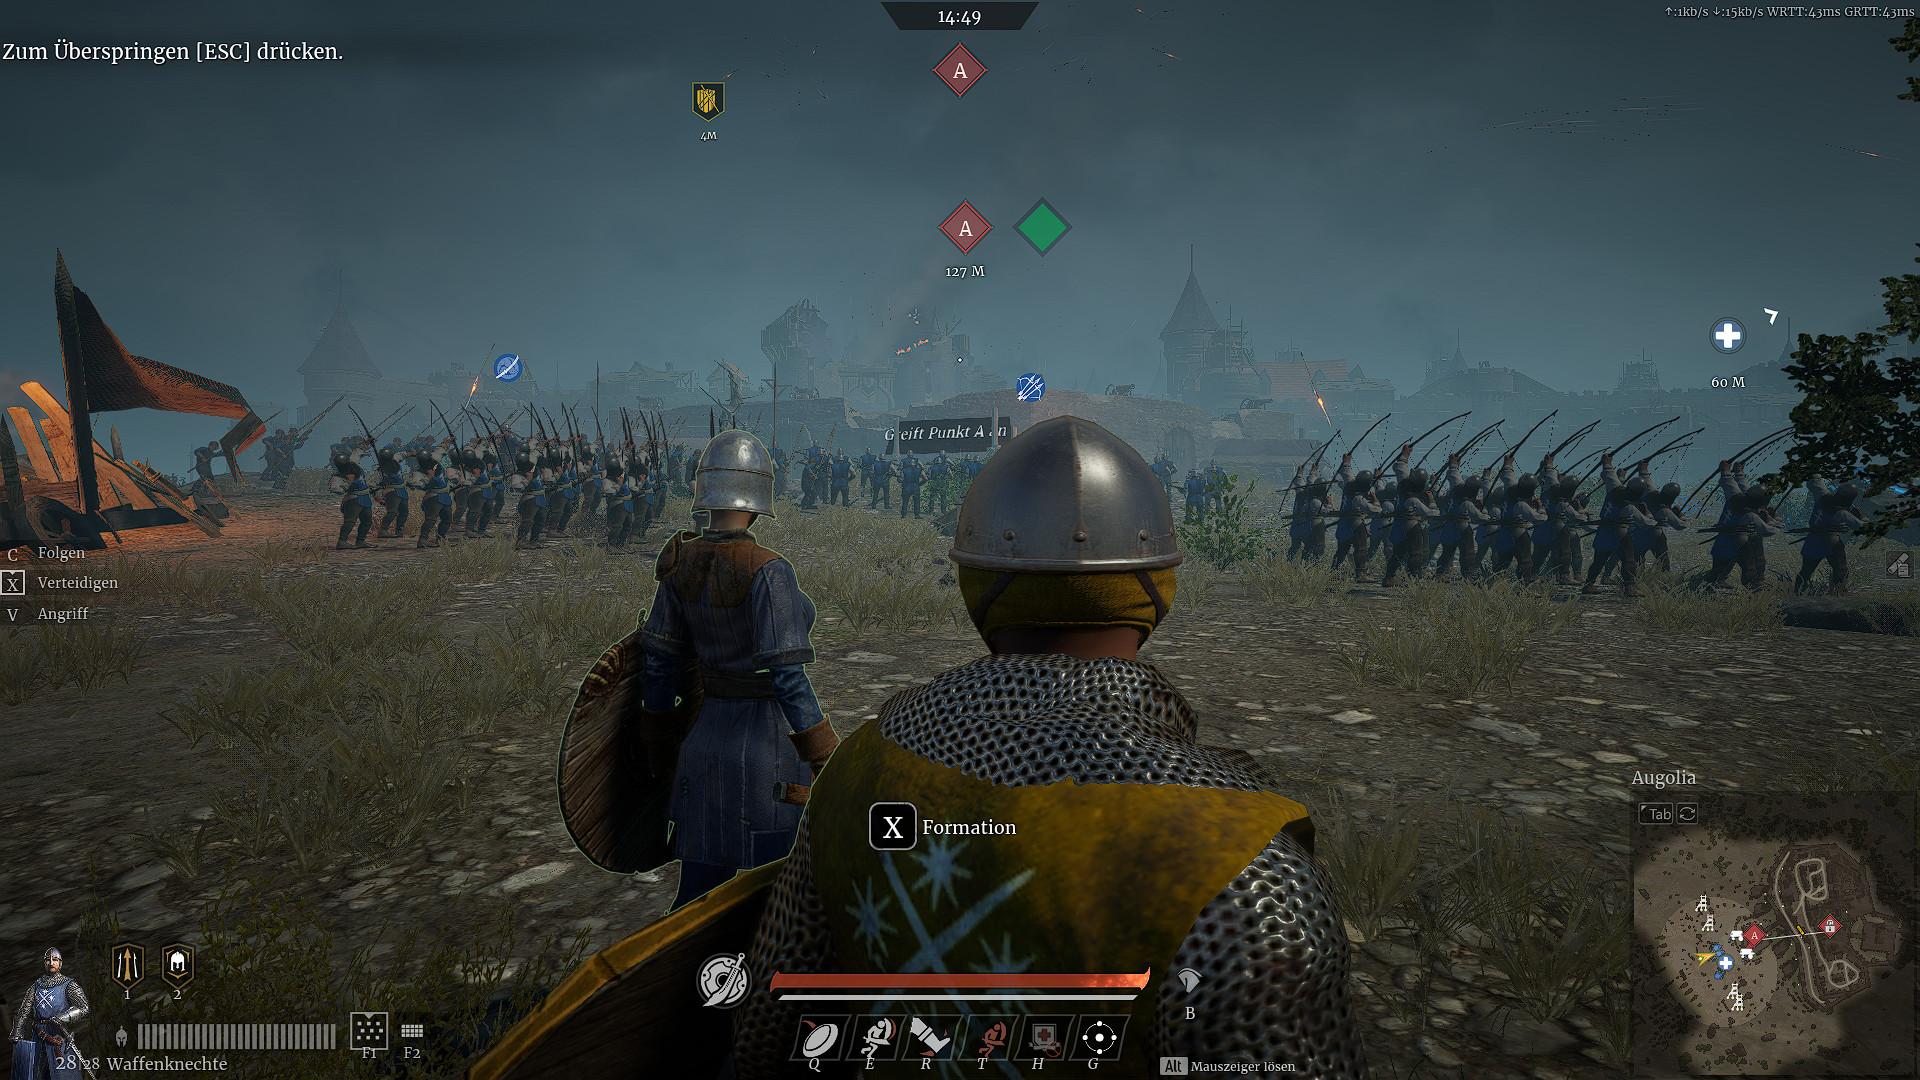 Screenshot 1 - Conqueror's Blade